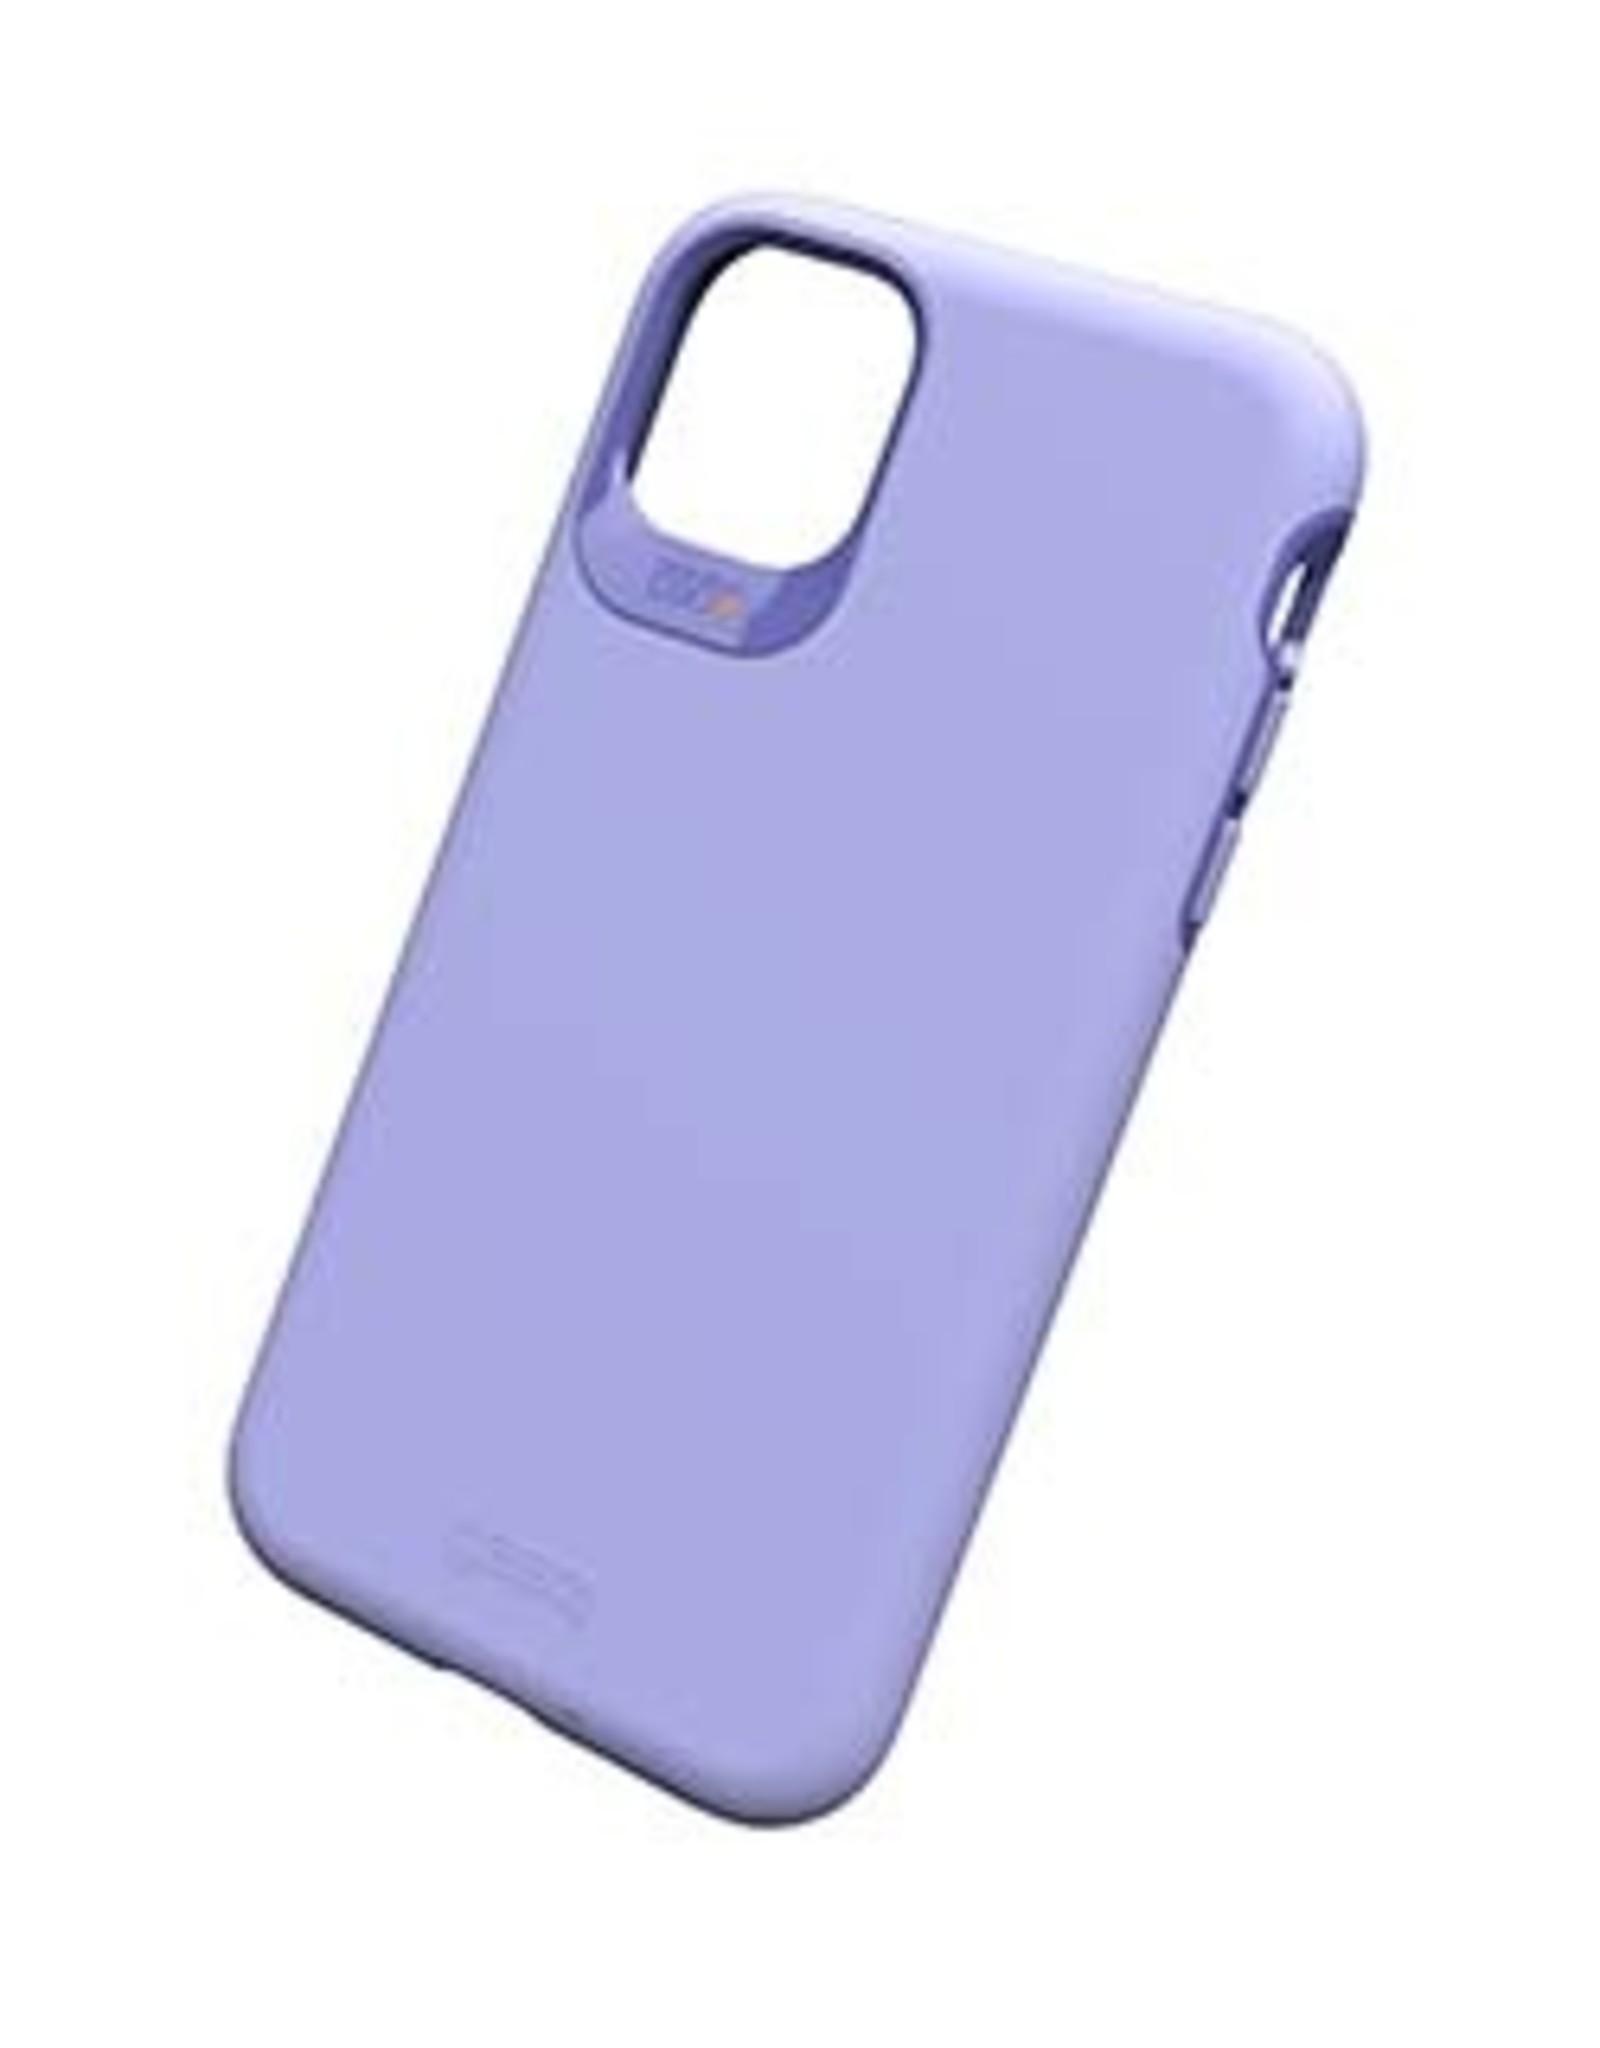 GEAR4 GEAR4 | iPhone 11 D3O Purple (Lilac) Holborn Case 15-04823